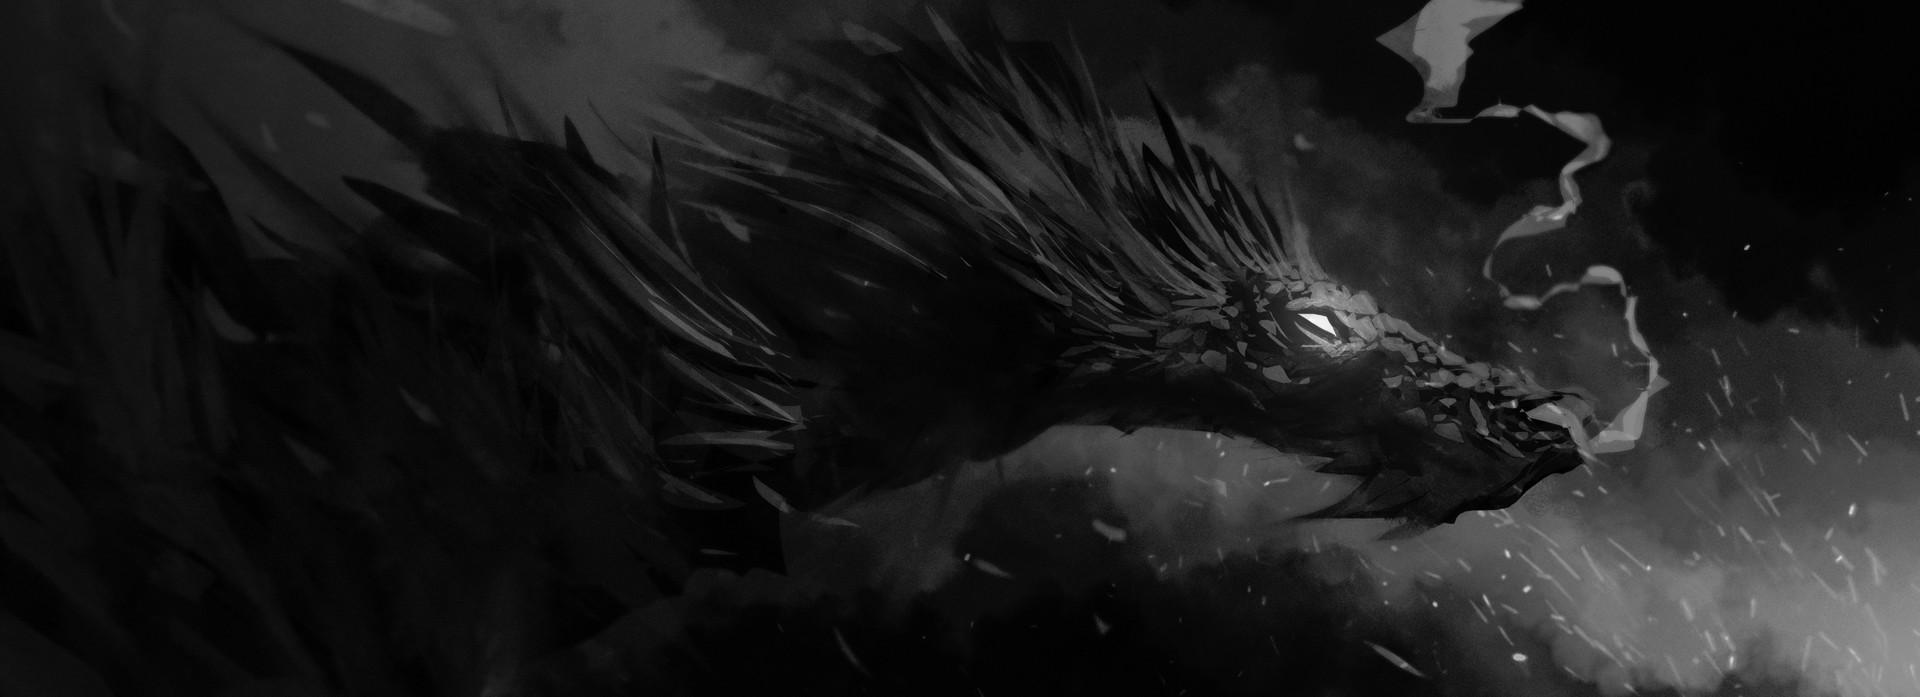 Federico ferrarese fede dragon gray